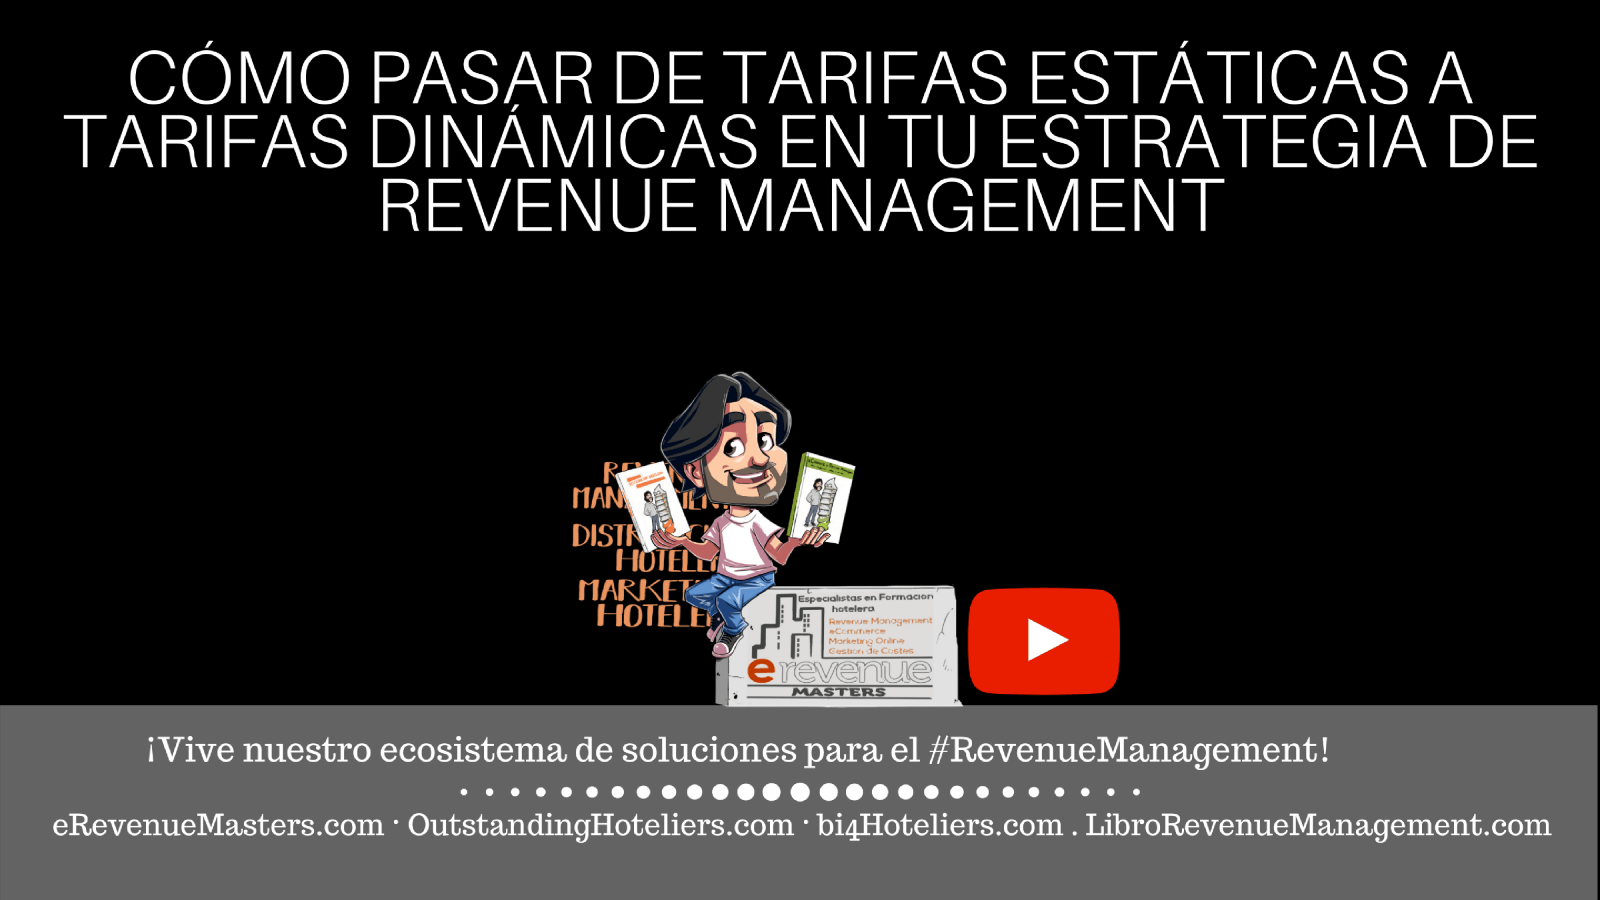 Cómo pasar de Tarifas Estáticas a tarifas Dinámicas en tu estrategia de Revenue Management